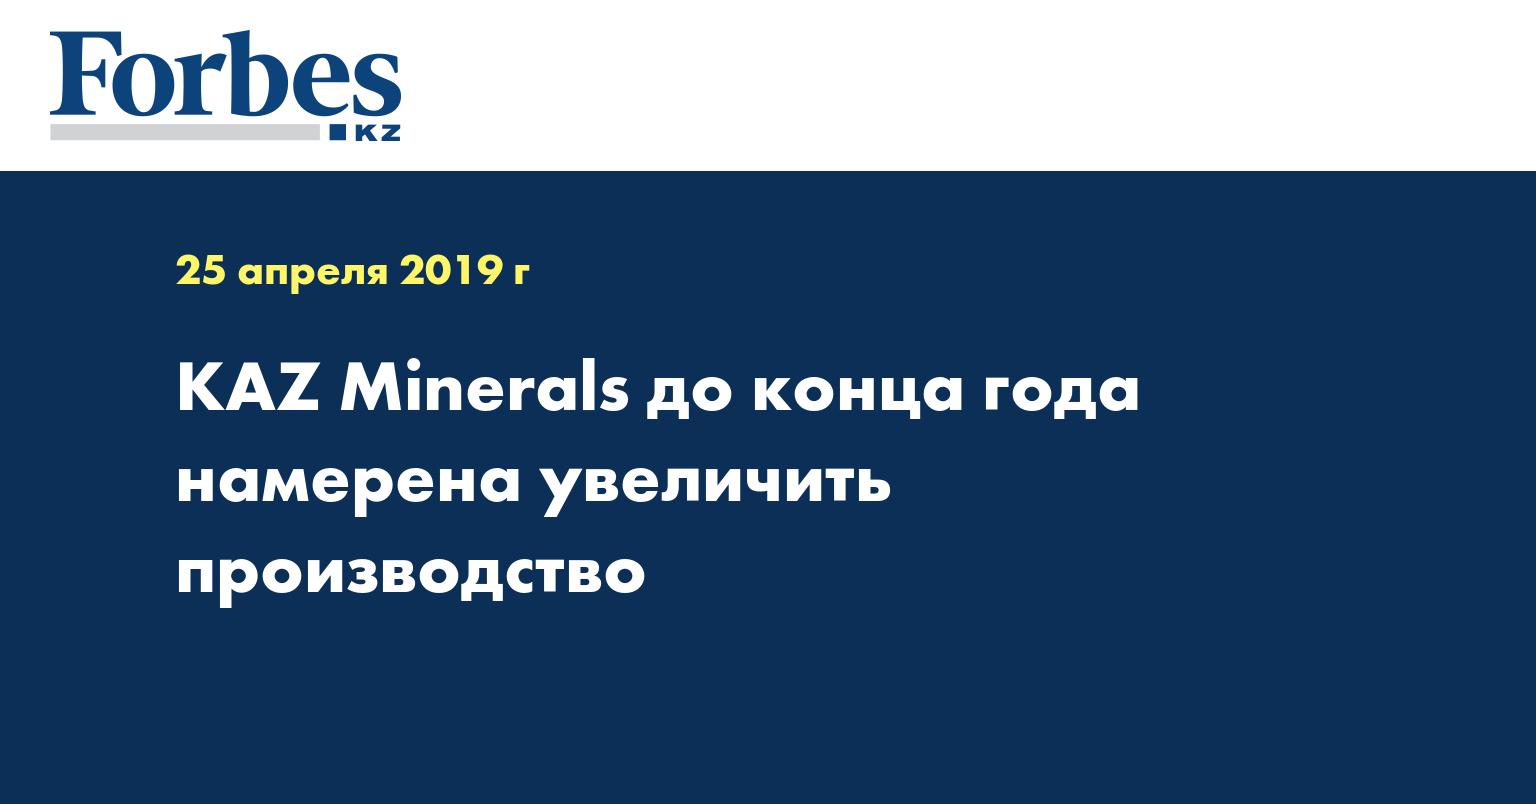 KAZ Minerals до конца года намерена увеличить производство